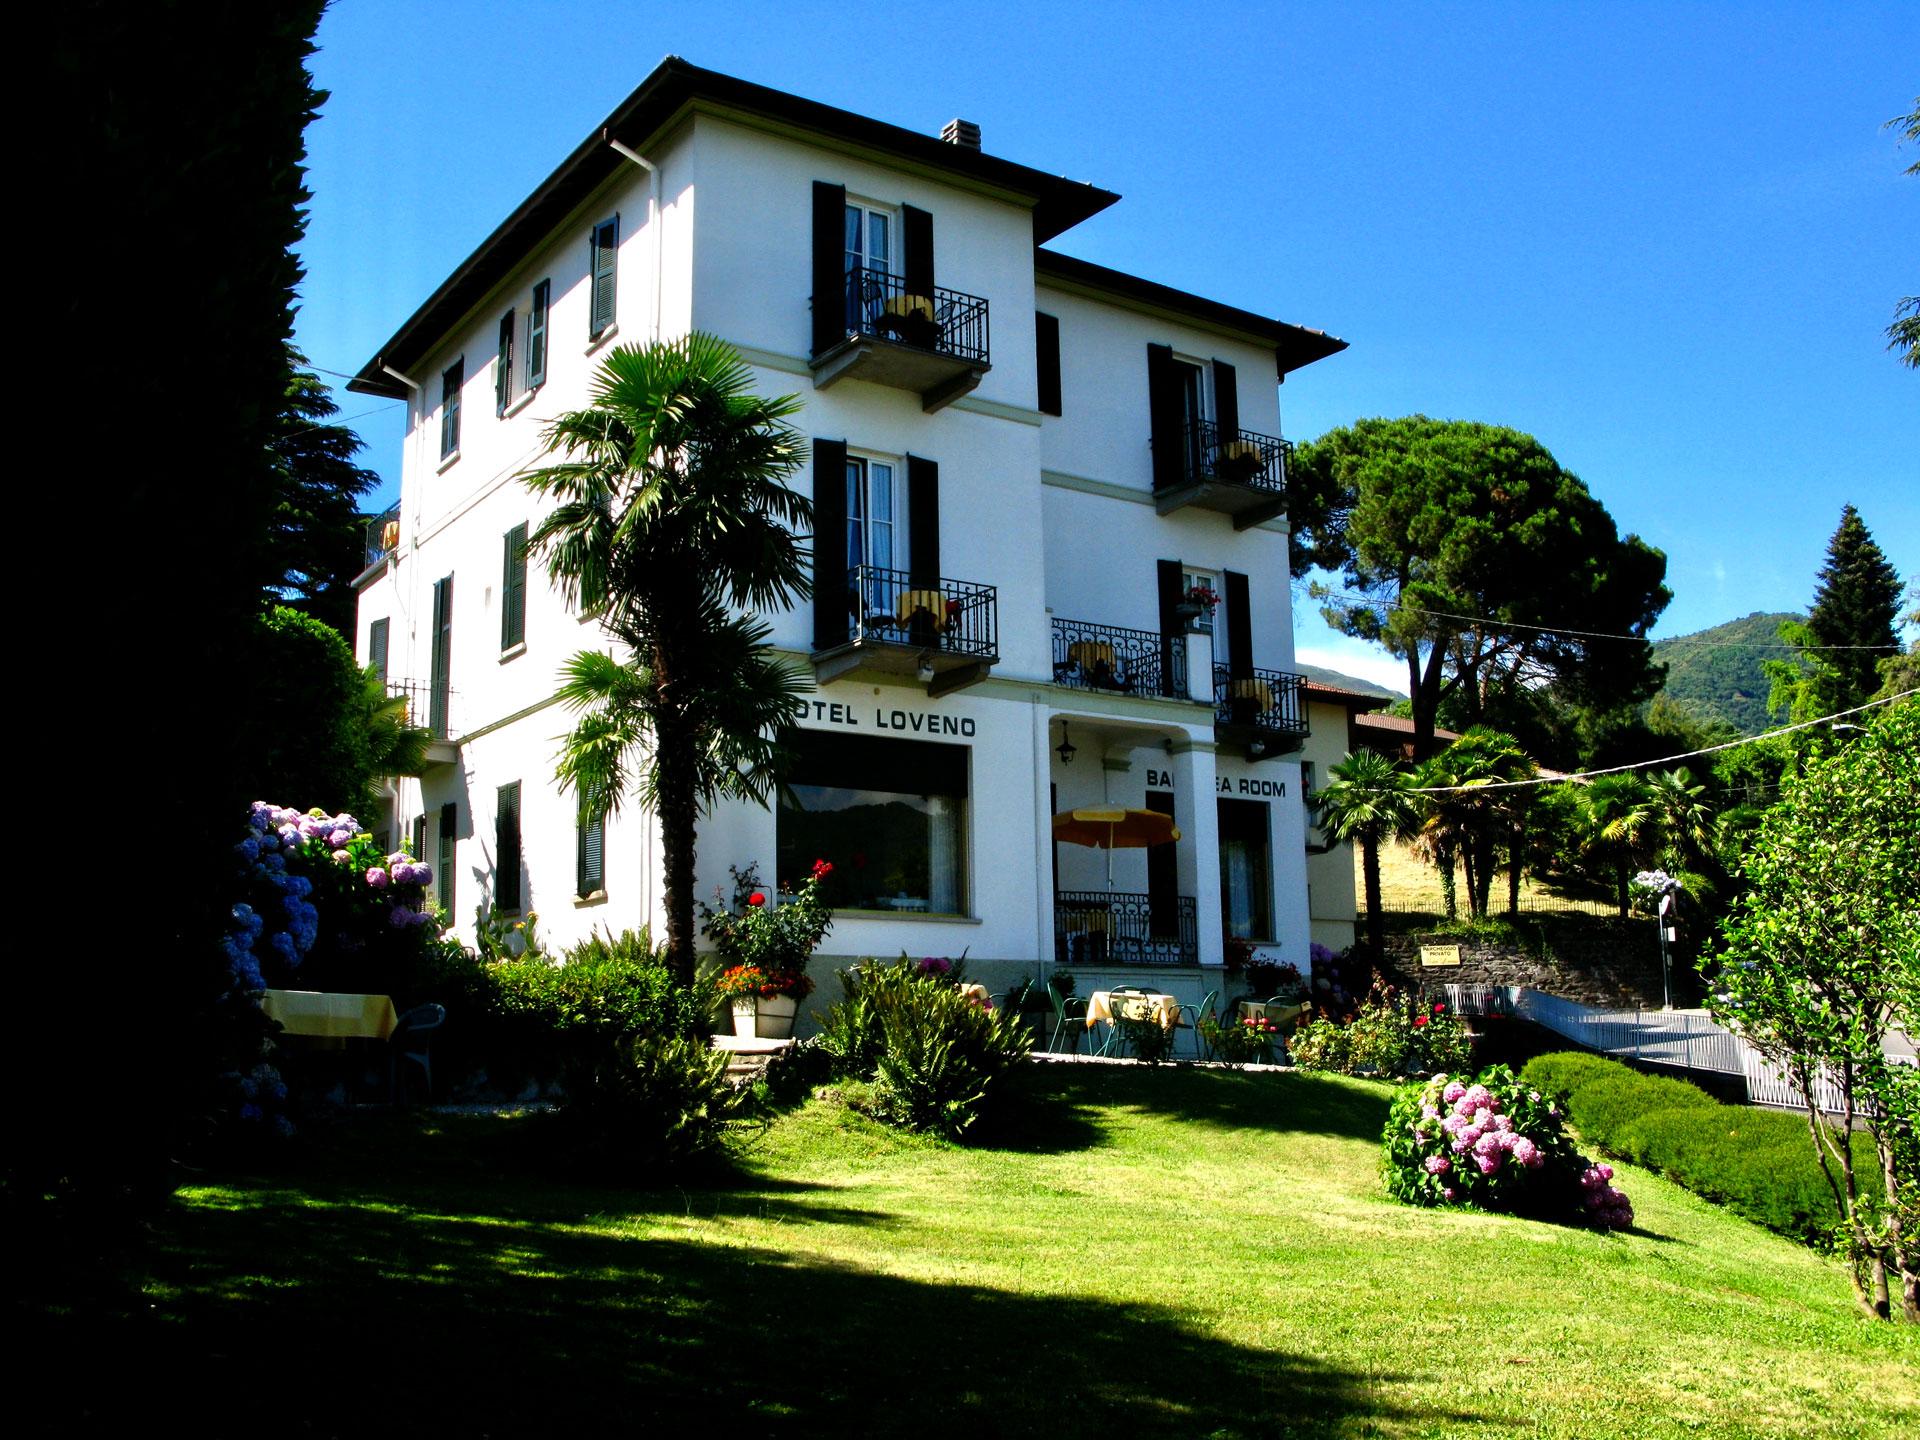 Hotel Loveno Lake Como Italy